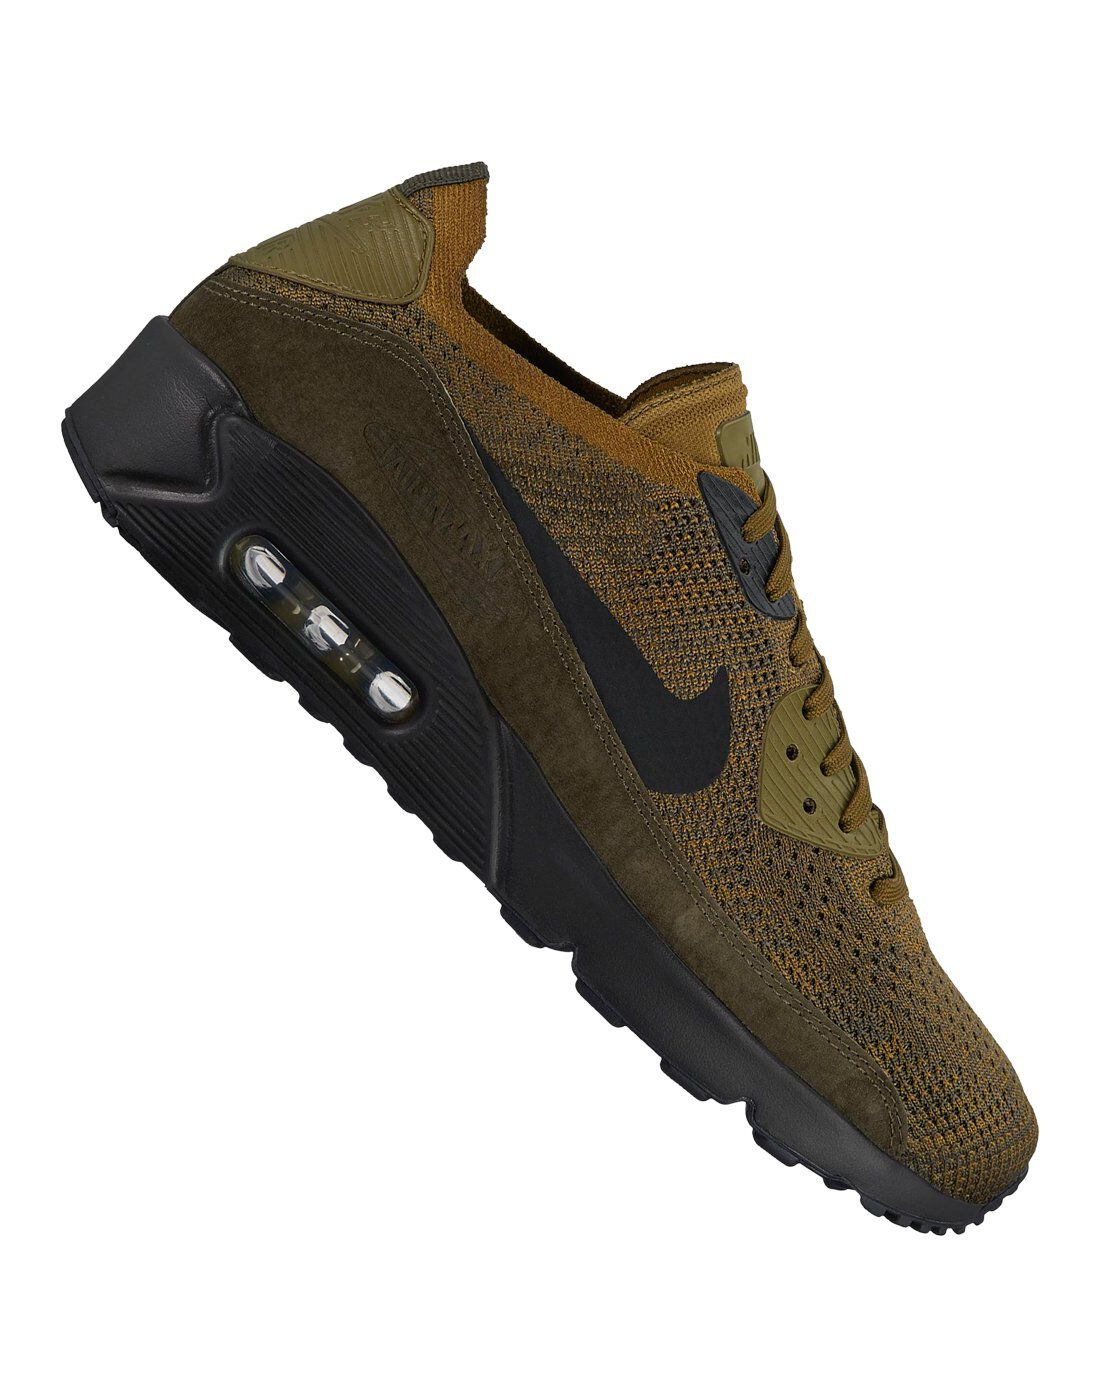 Men's Nike Air Max 90 Ultra Flyknit | Green khaki | Life Style Sports